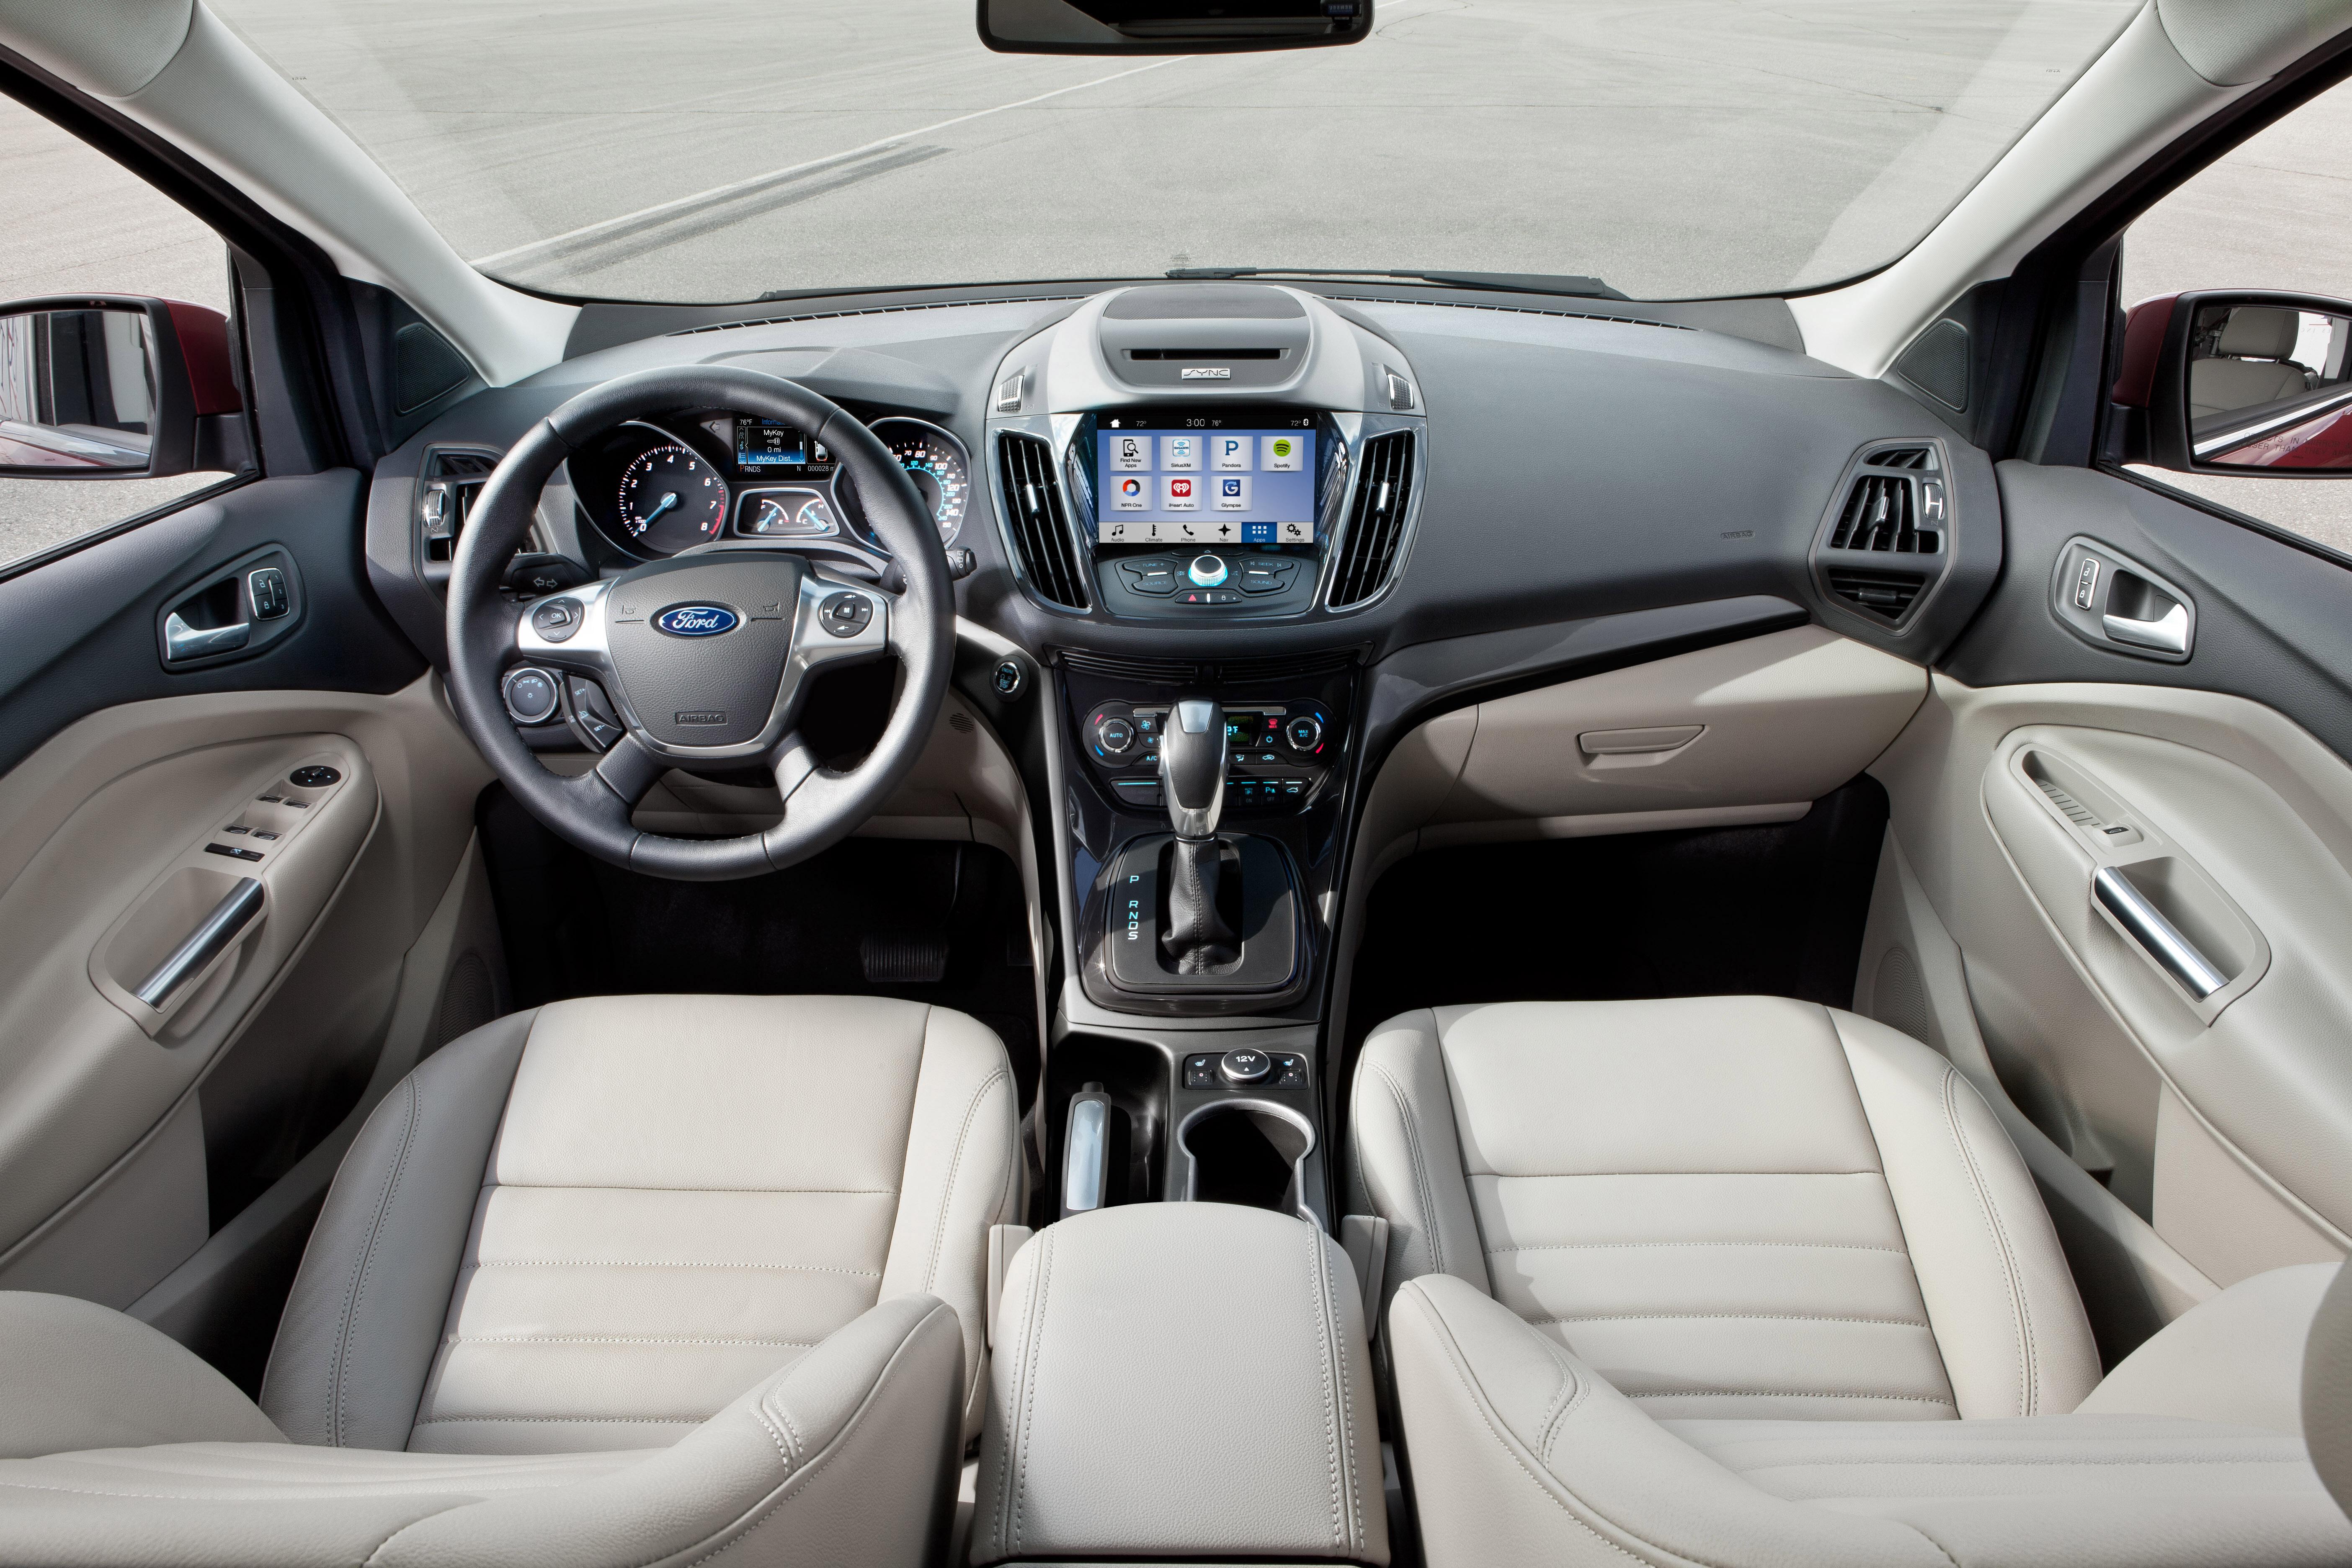 Ford SYNC 3